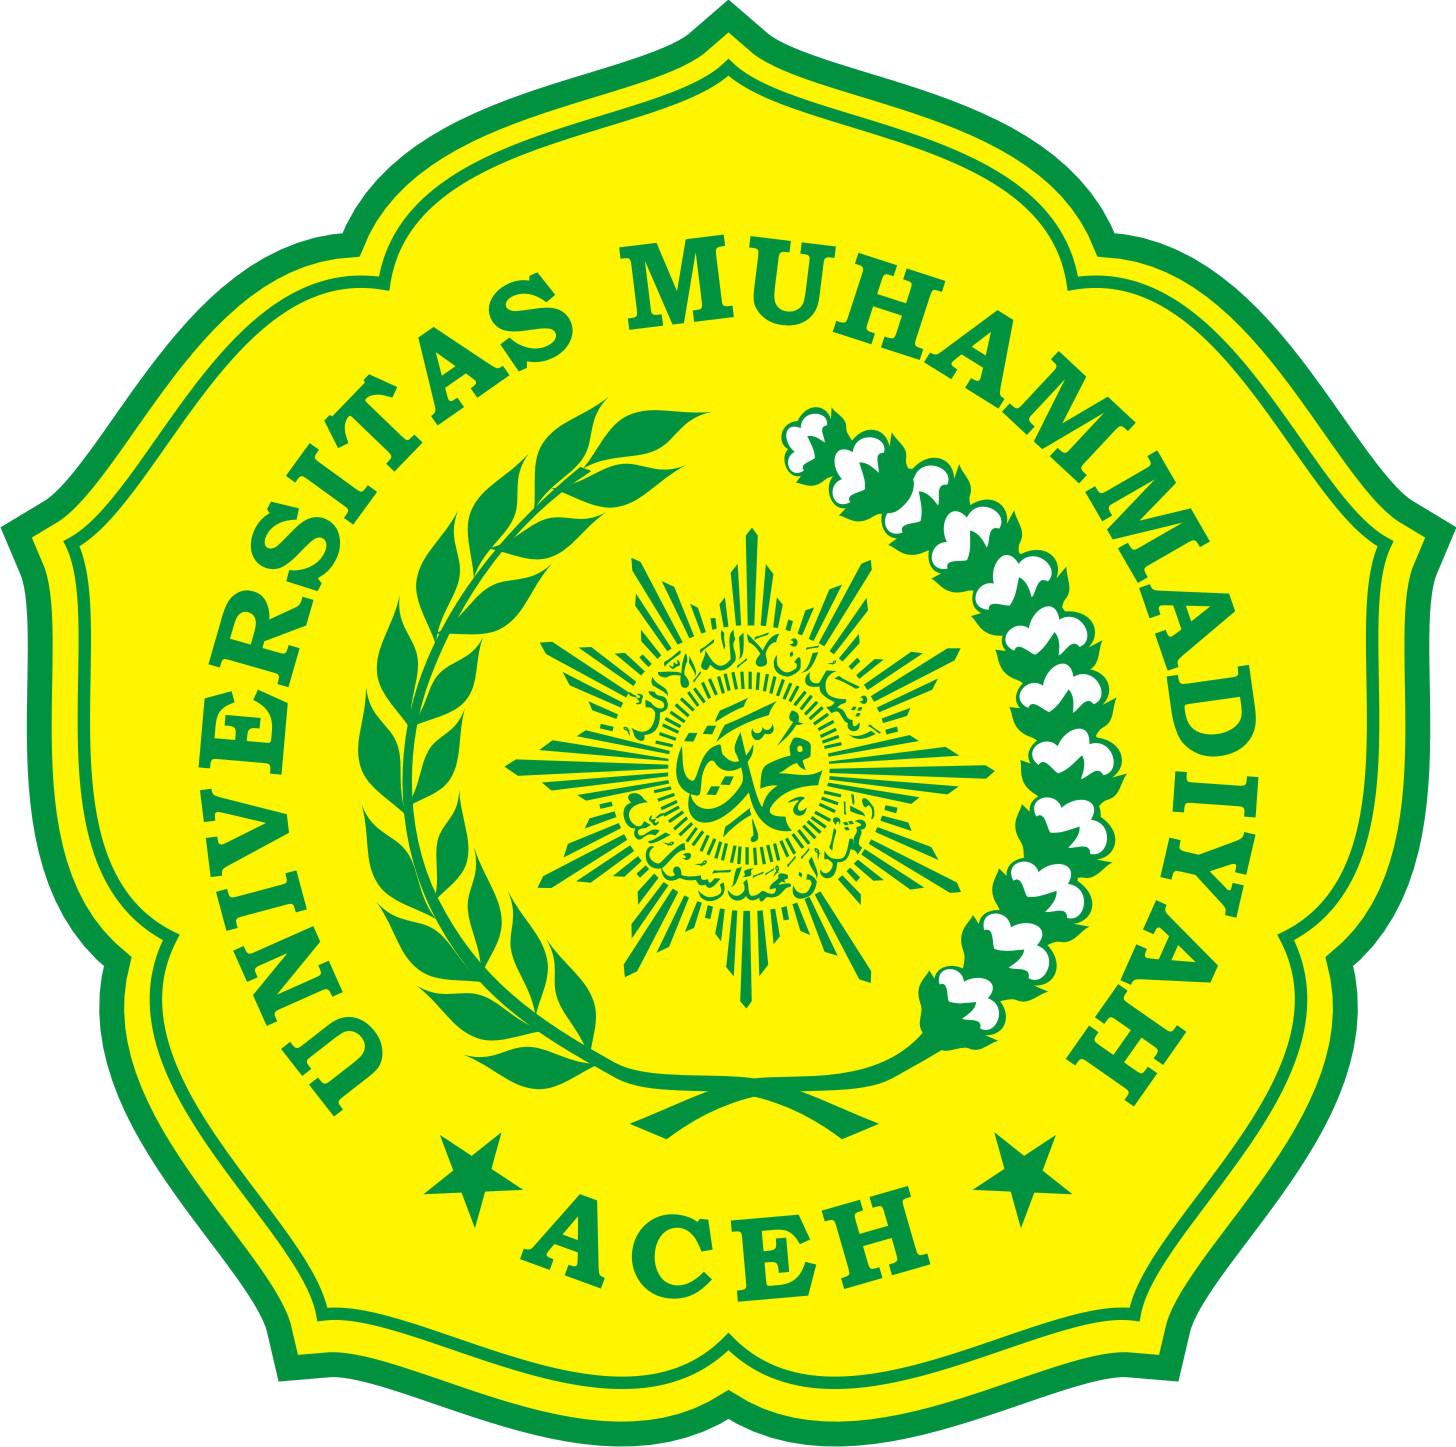 Lambang Dan Arti Universitas Muhammadiyah Aceh